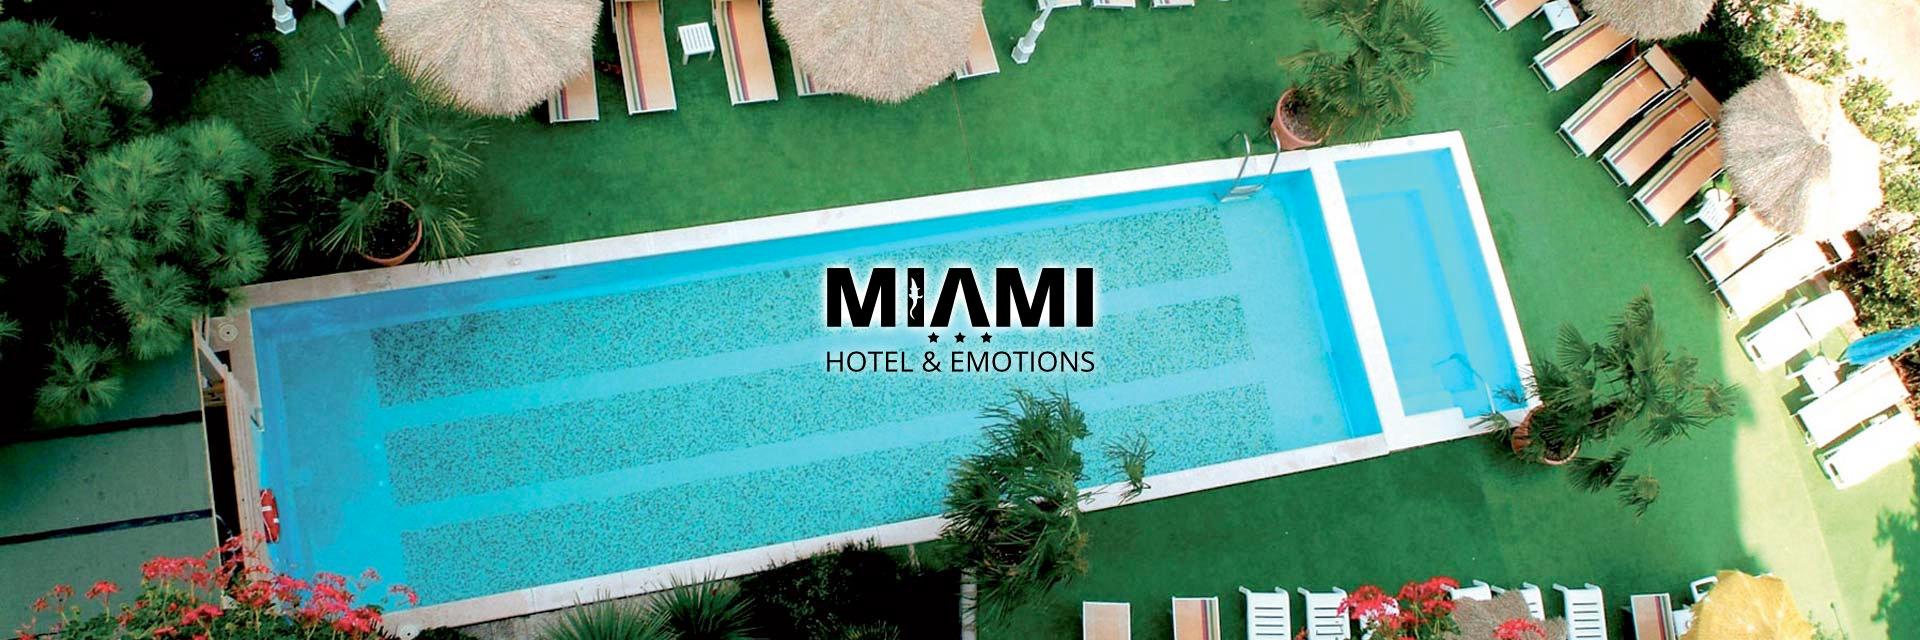 Hotel Miami - Just Bed Hotel Plus